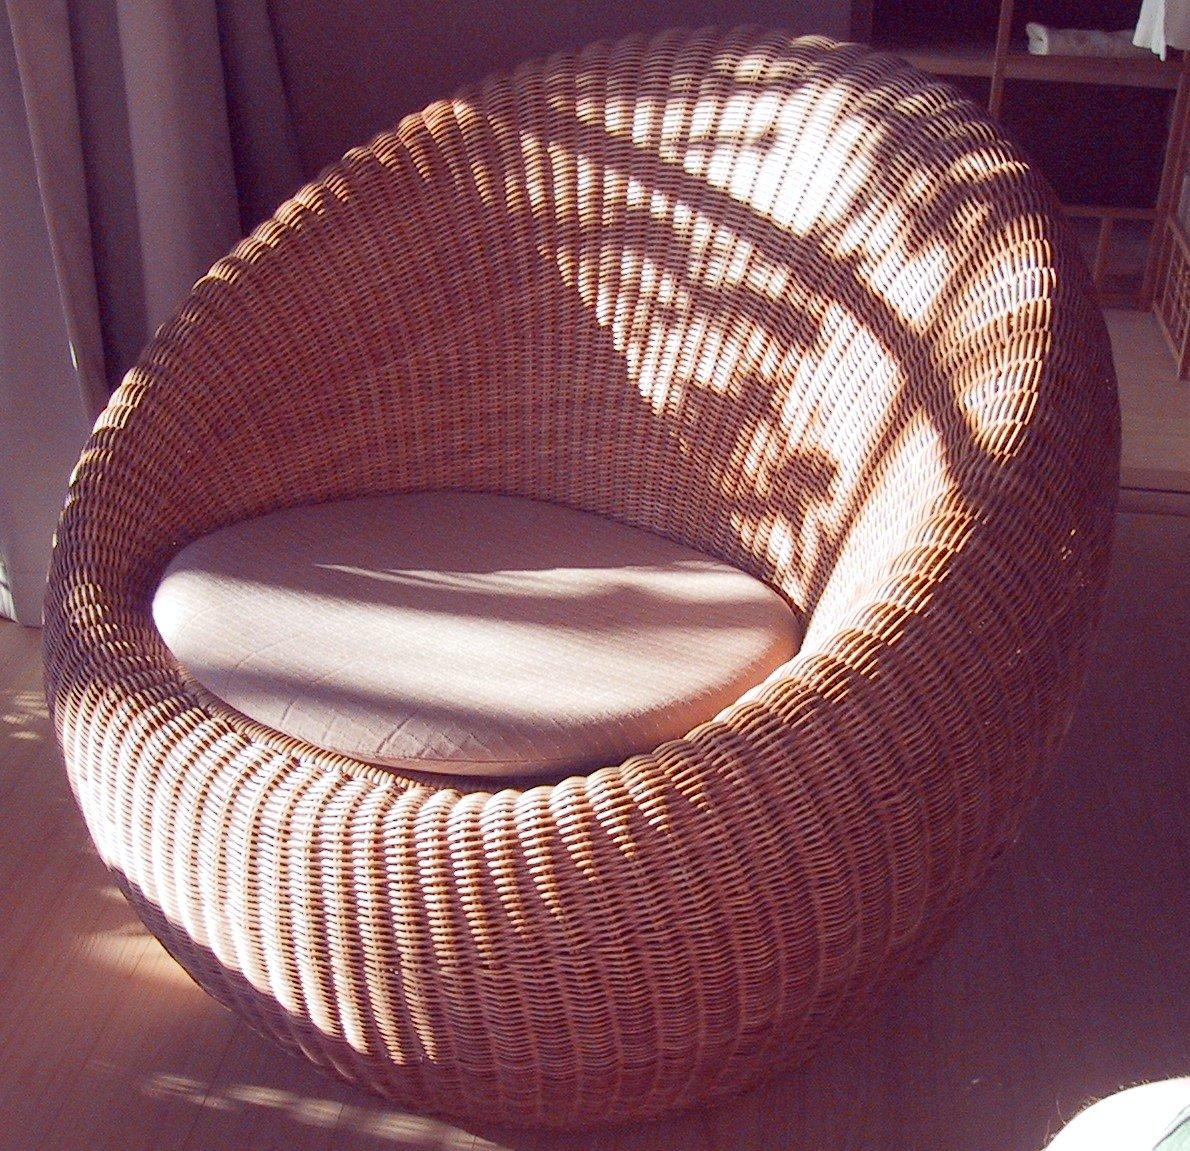 Wicker bamboo round chair on round rattan chair vintage furniture